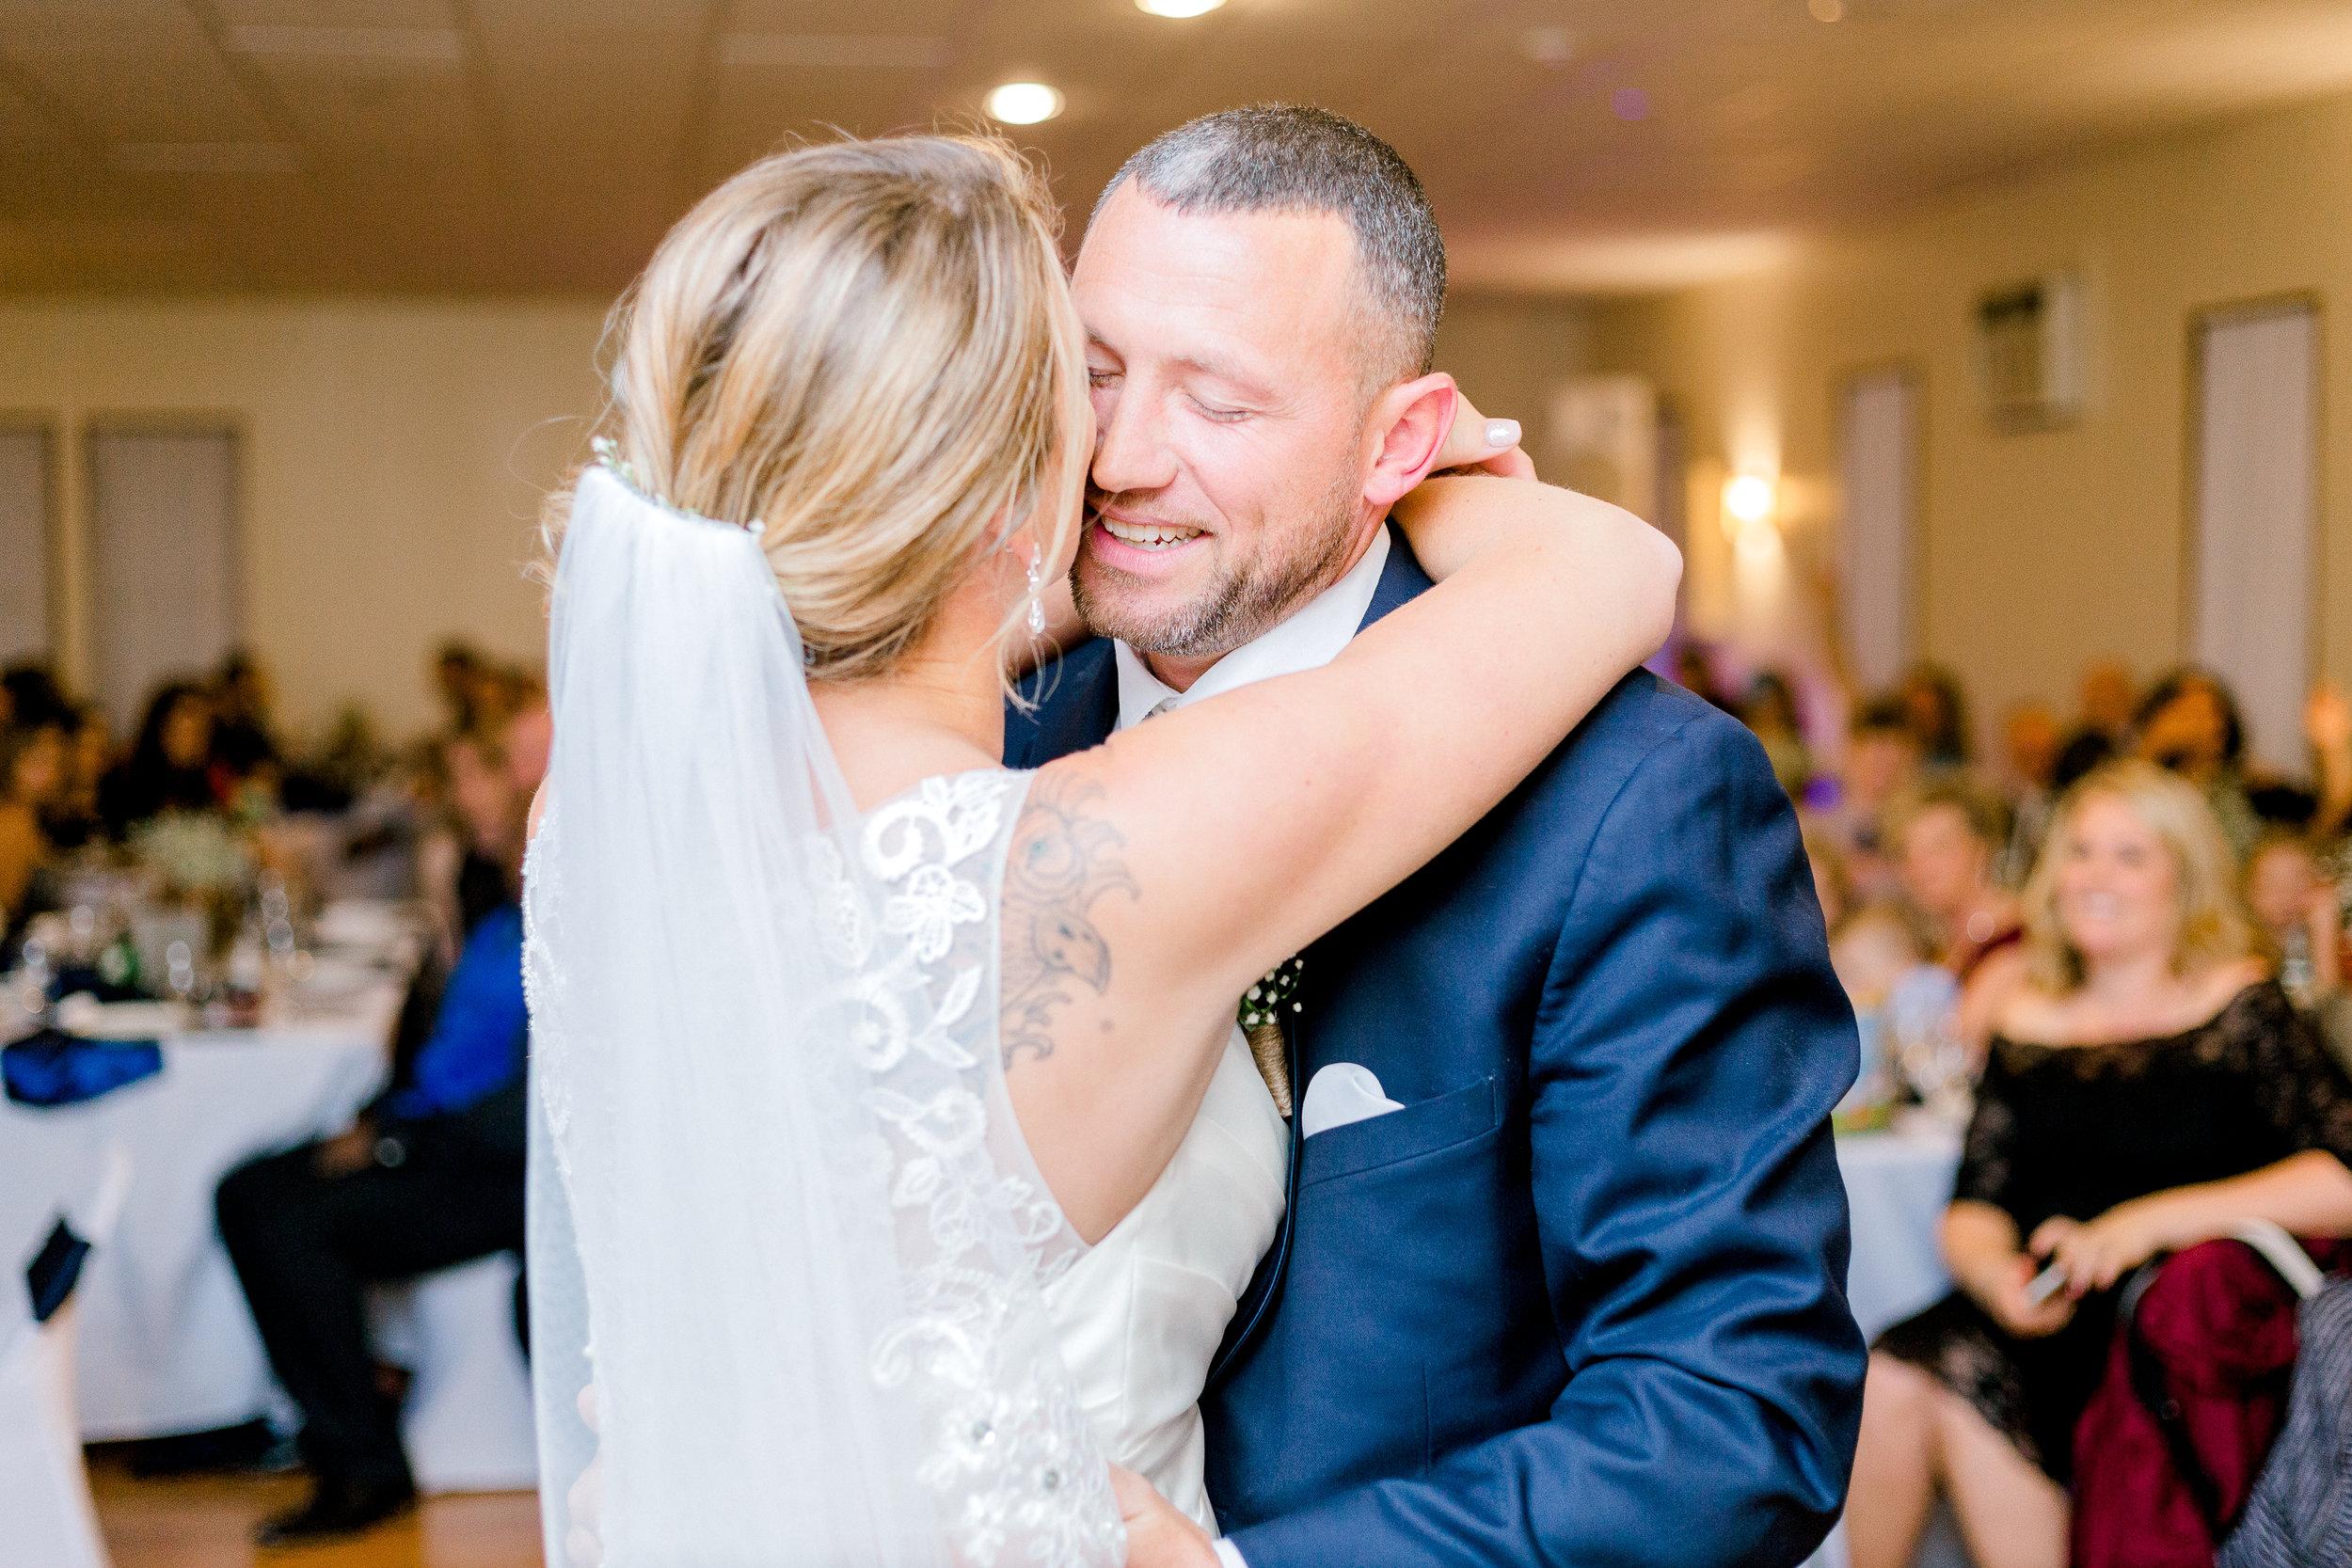 Pennsylvania October Fall Lehigh Valley wedding and lifestyle photographer Lytle Photo Co (139 of 167).jpg